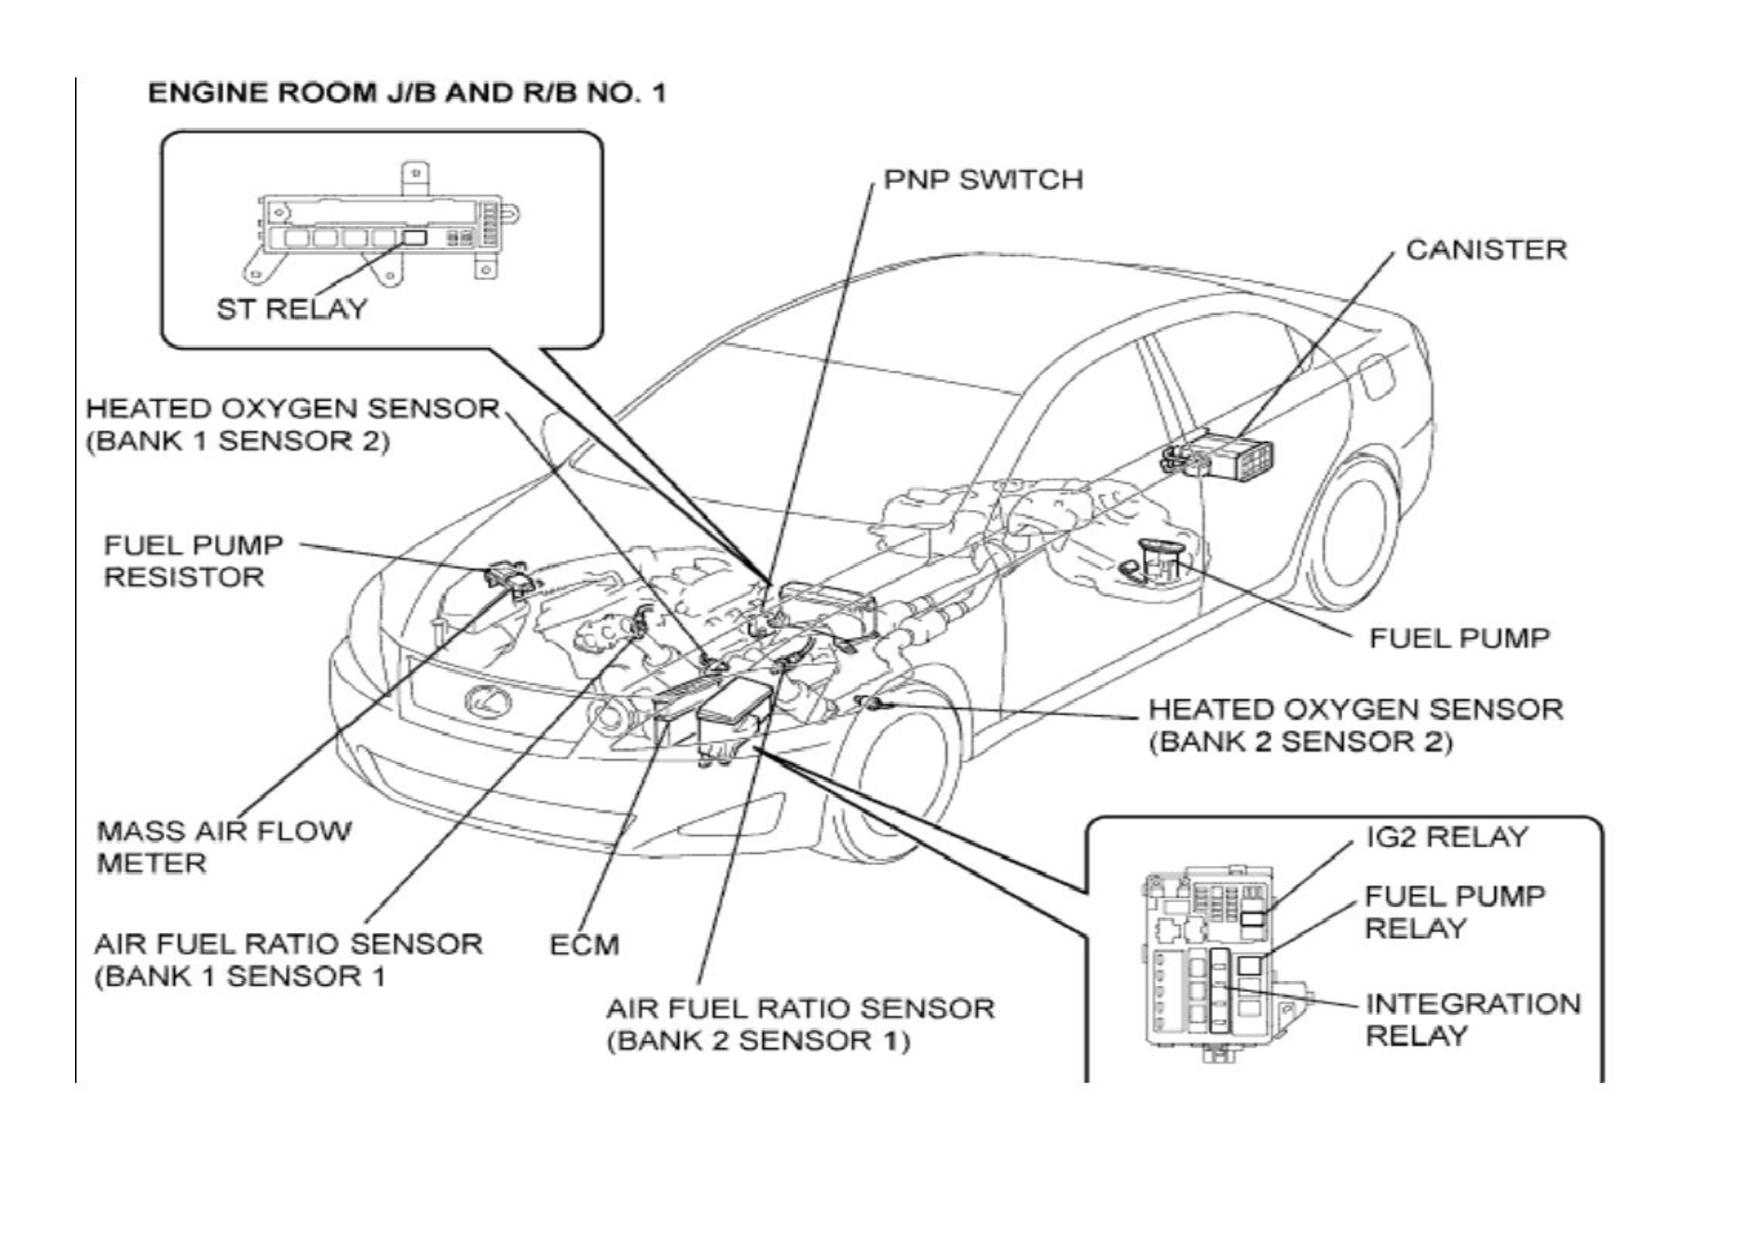 hight resolution of wiring diagram bank 1 sensor 2 location lexus es300 2002 lexus es3002000 lexus es300 engine diagram